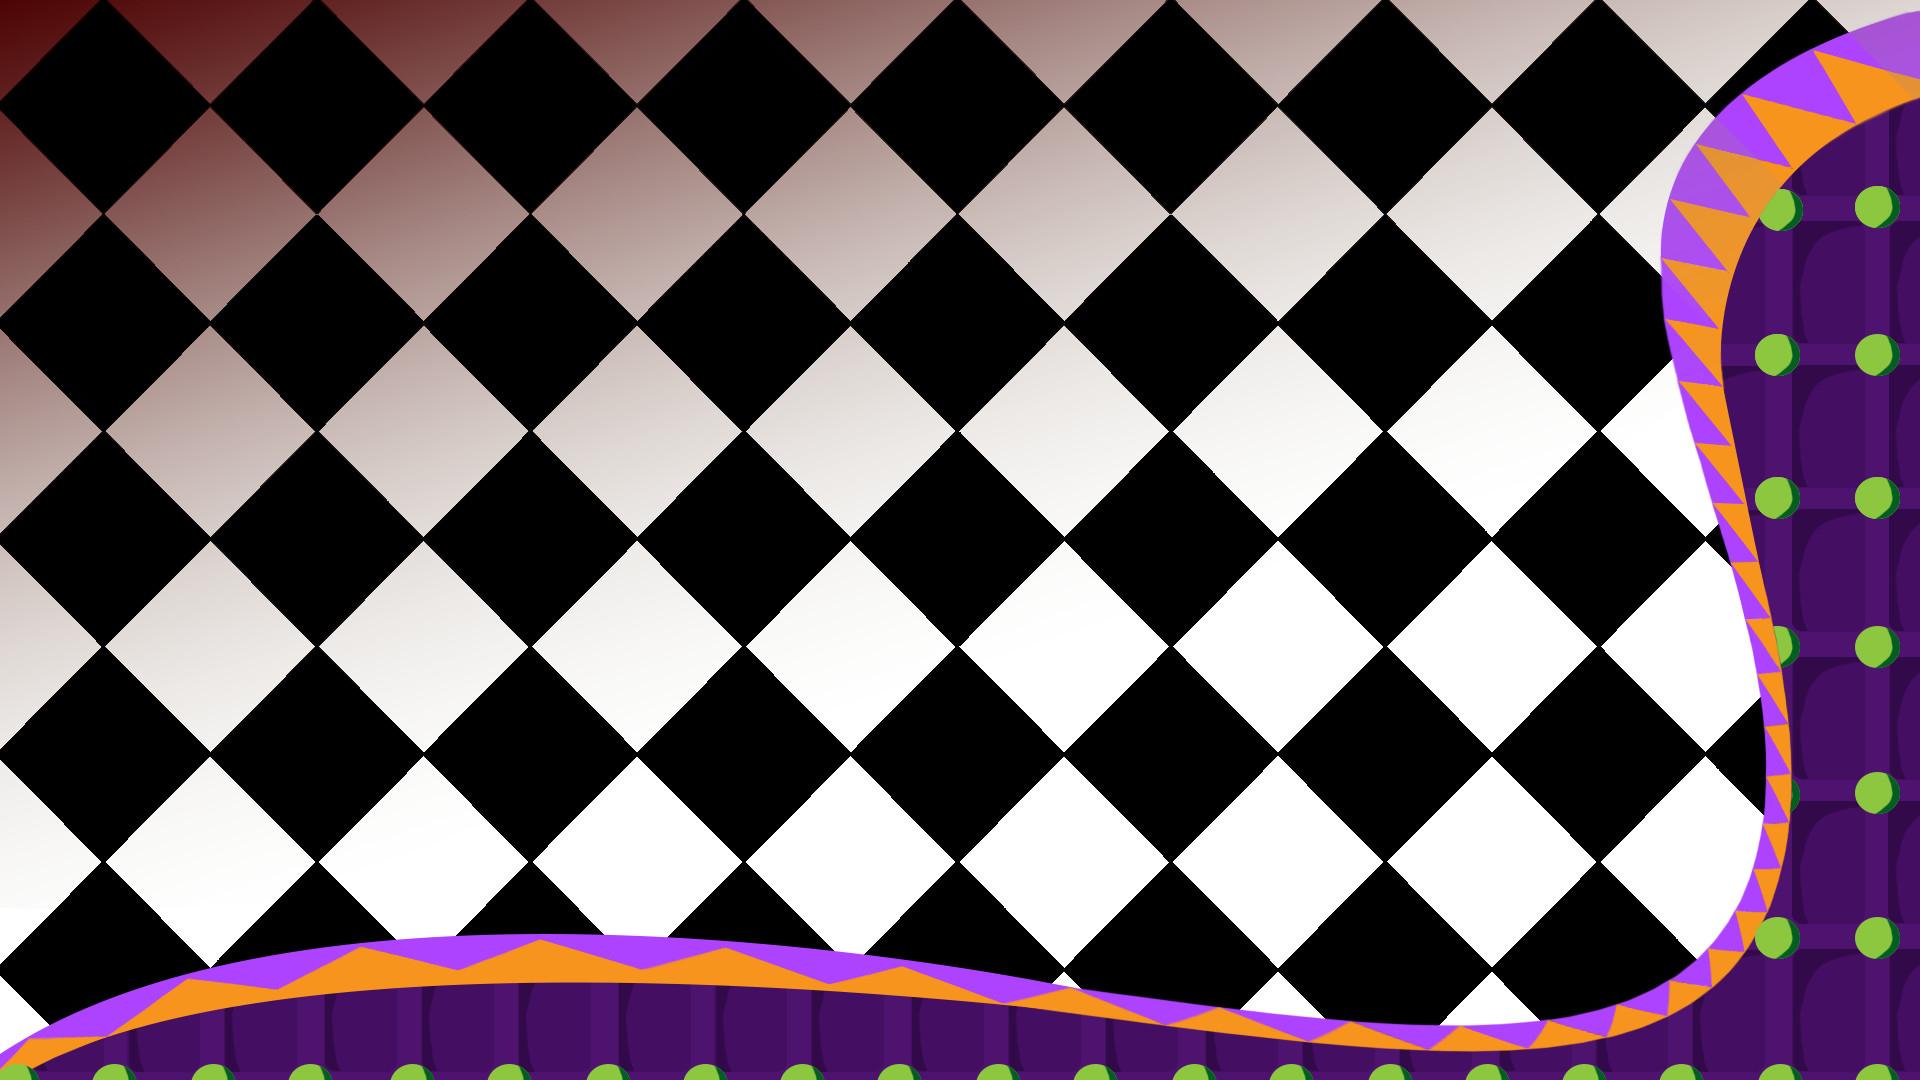 Res: 1920x1080, Jojo's Bizarre Adventure Zeppeli Wallpaper by Shubwubtub